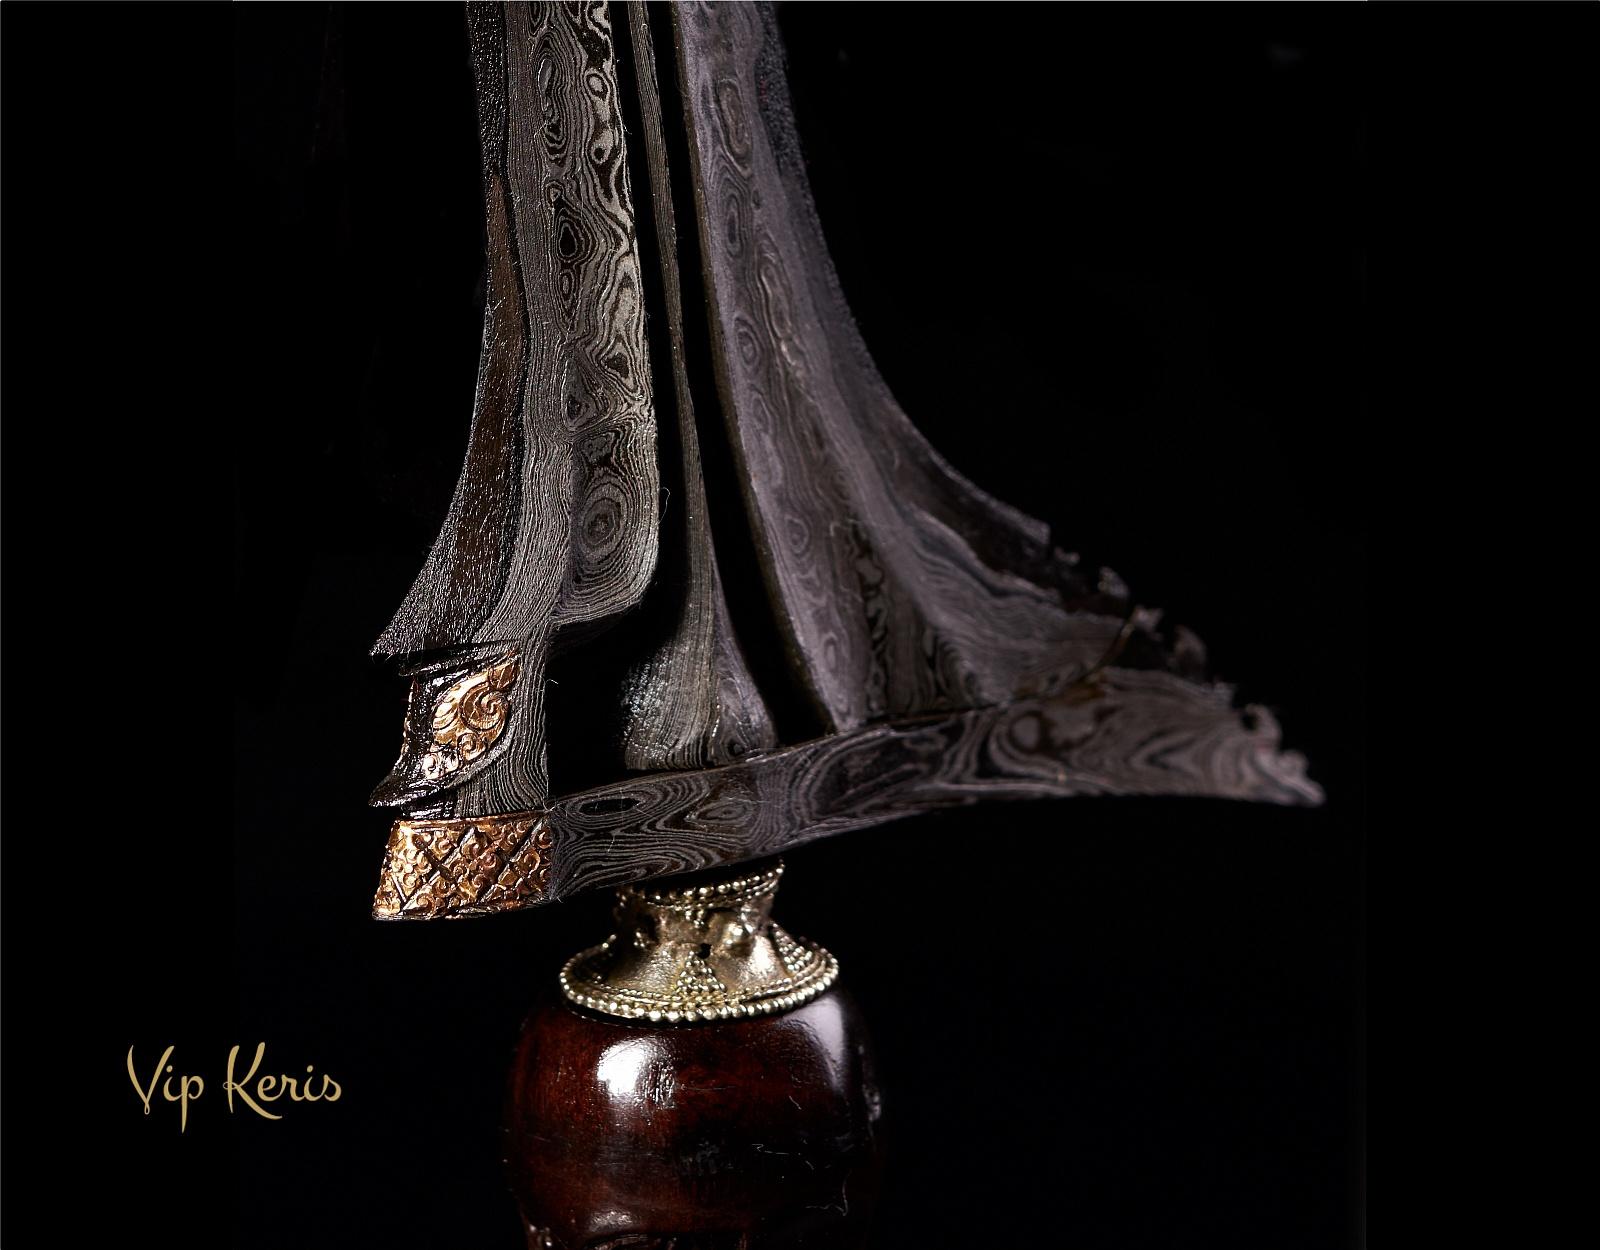 Королевский кинжал Крис Pasopati, HB7 фото VipKeris